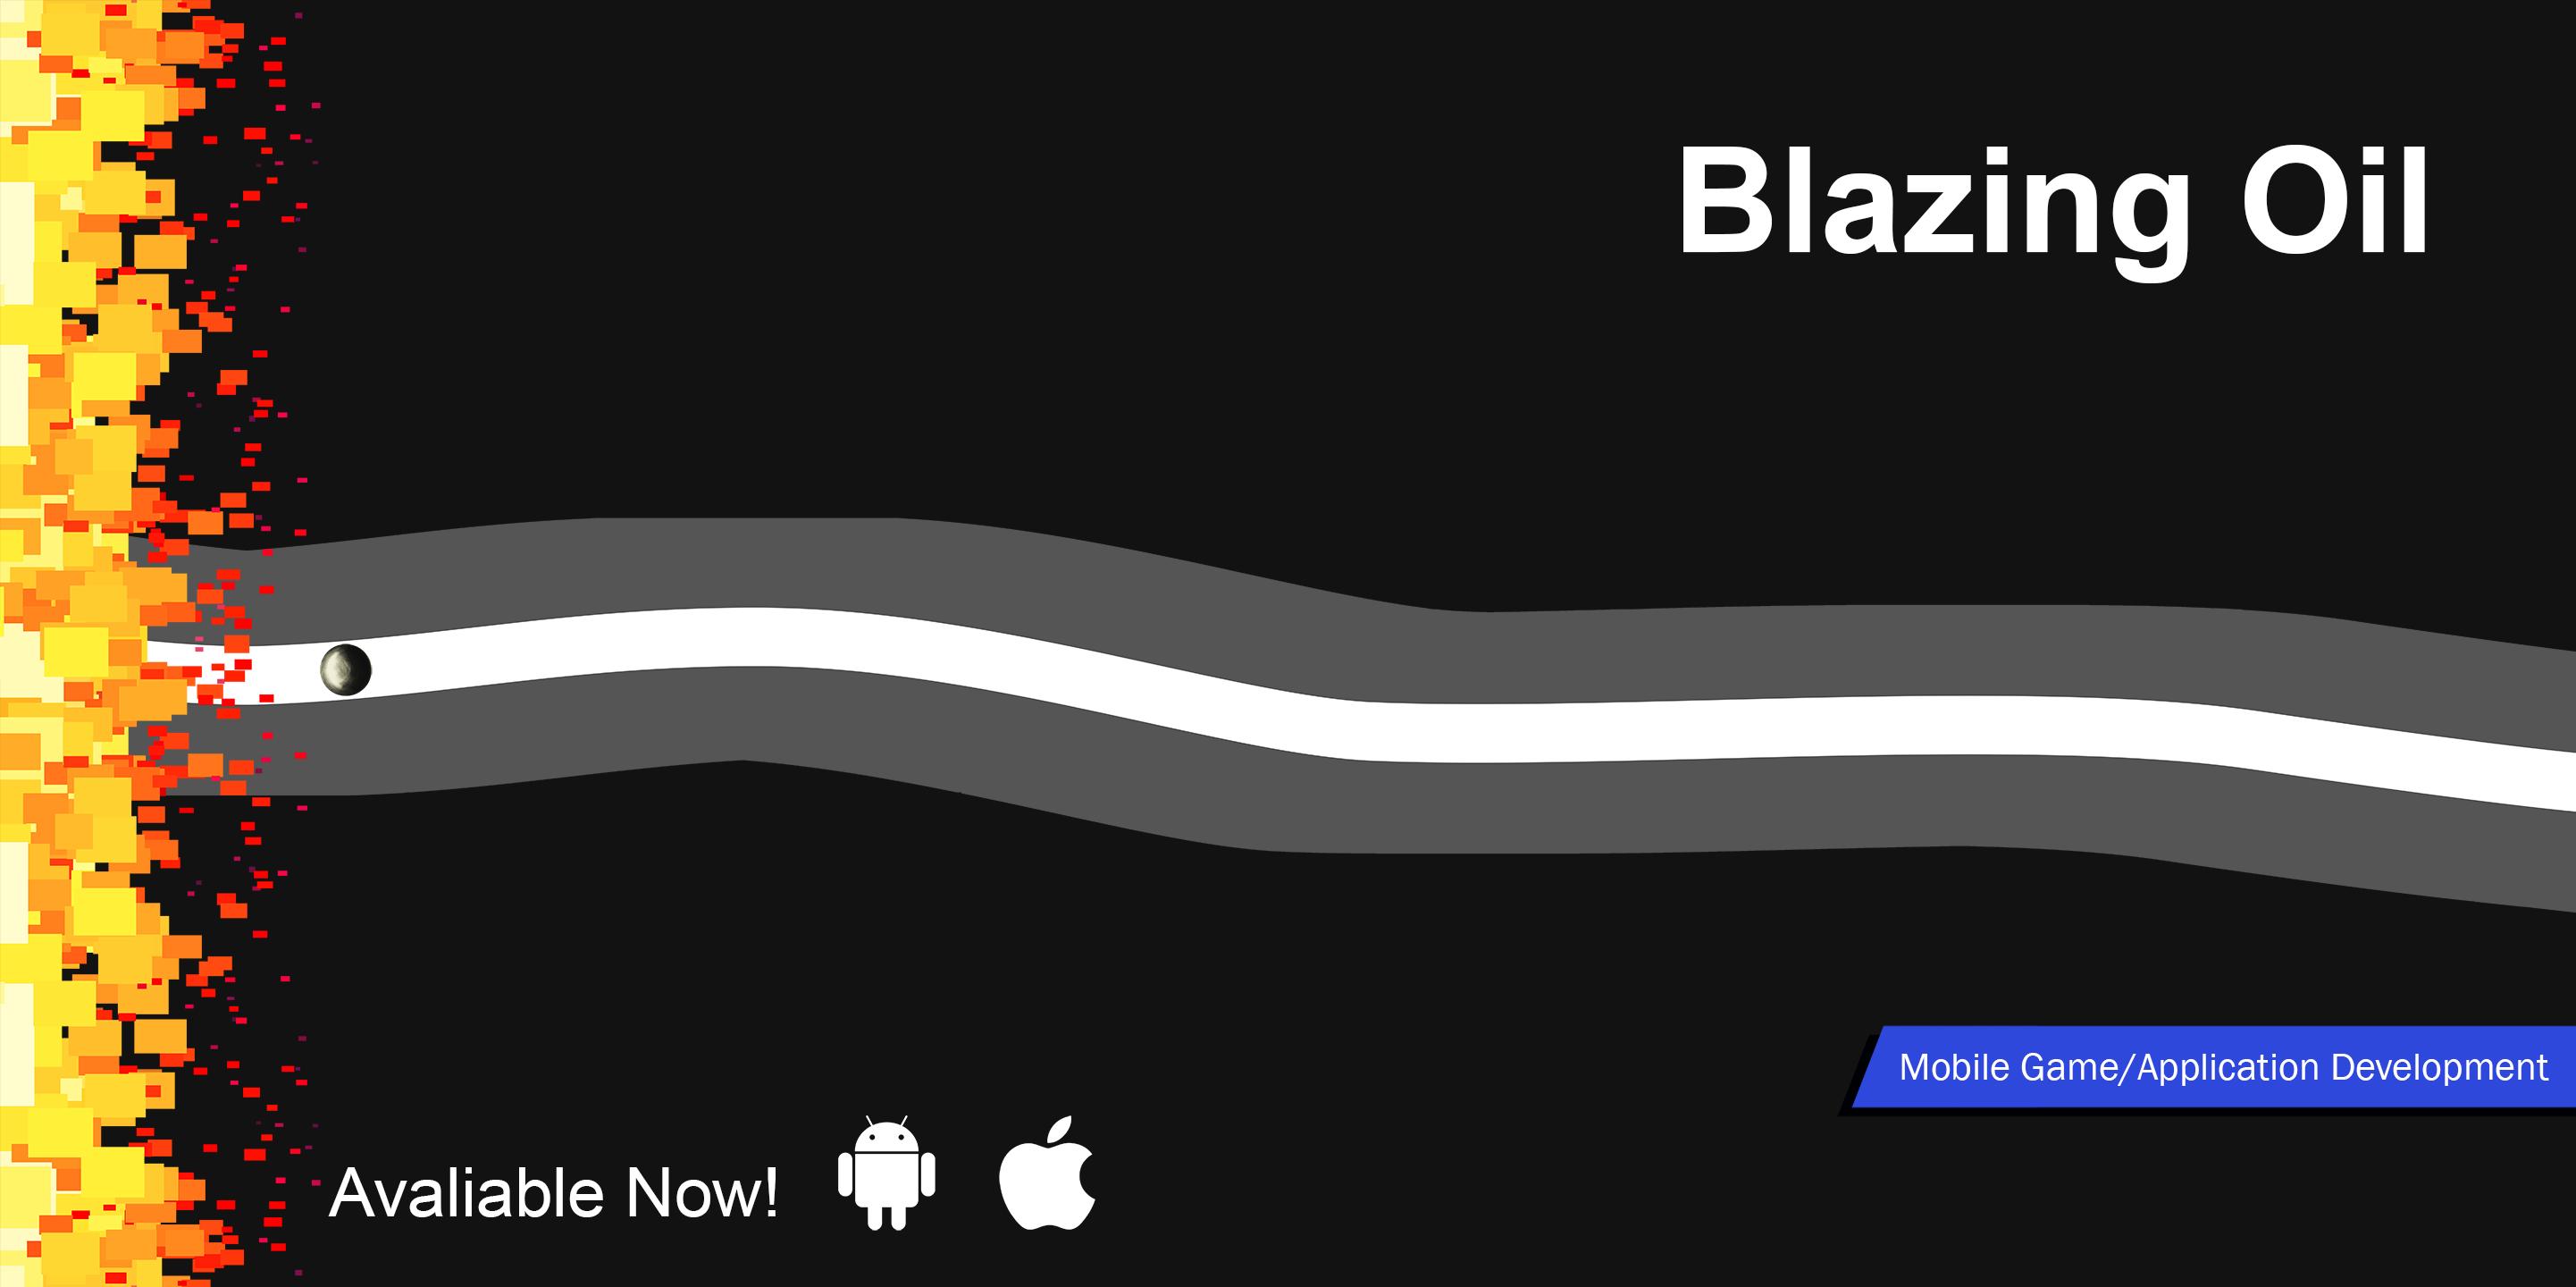 Blazing Oil